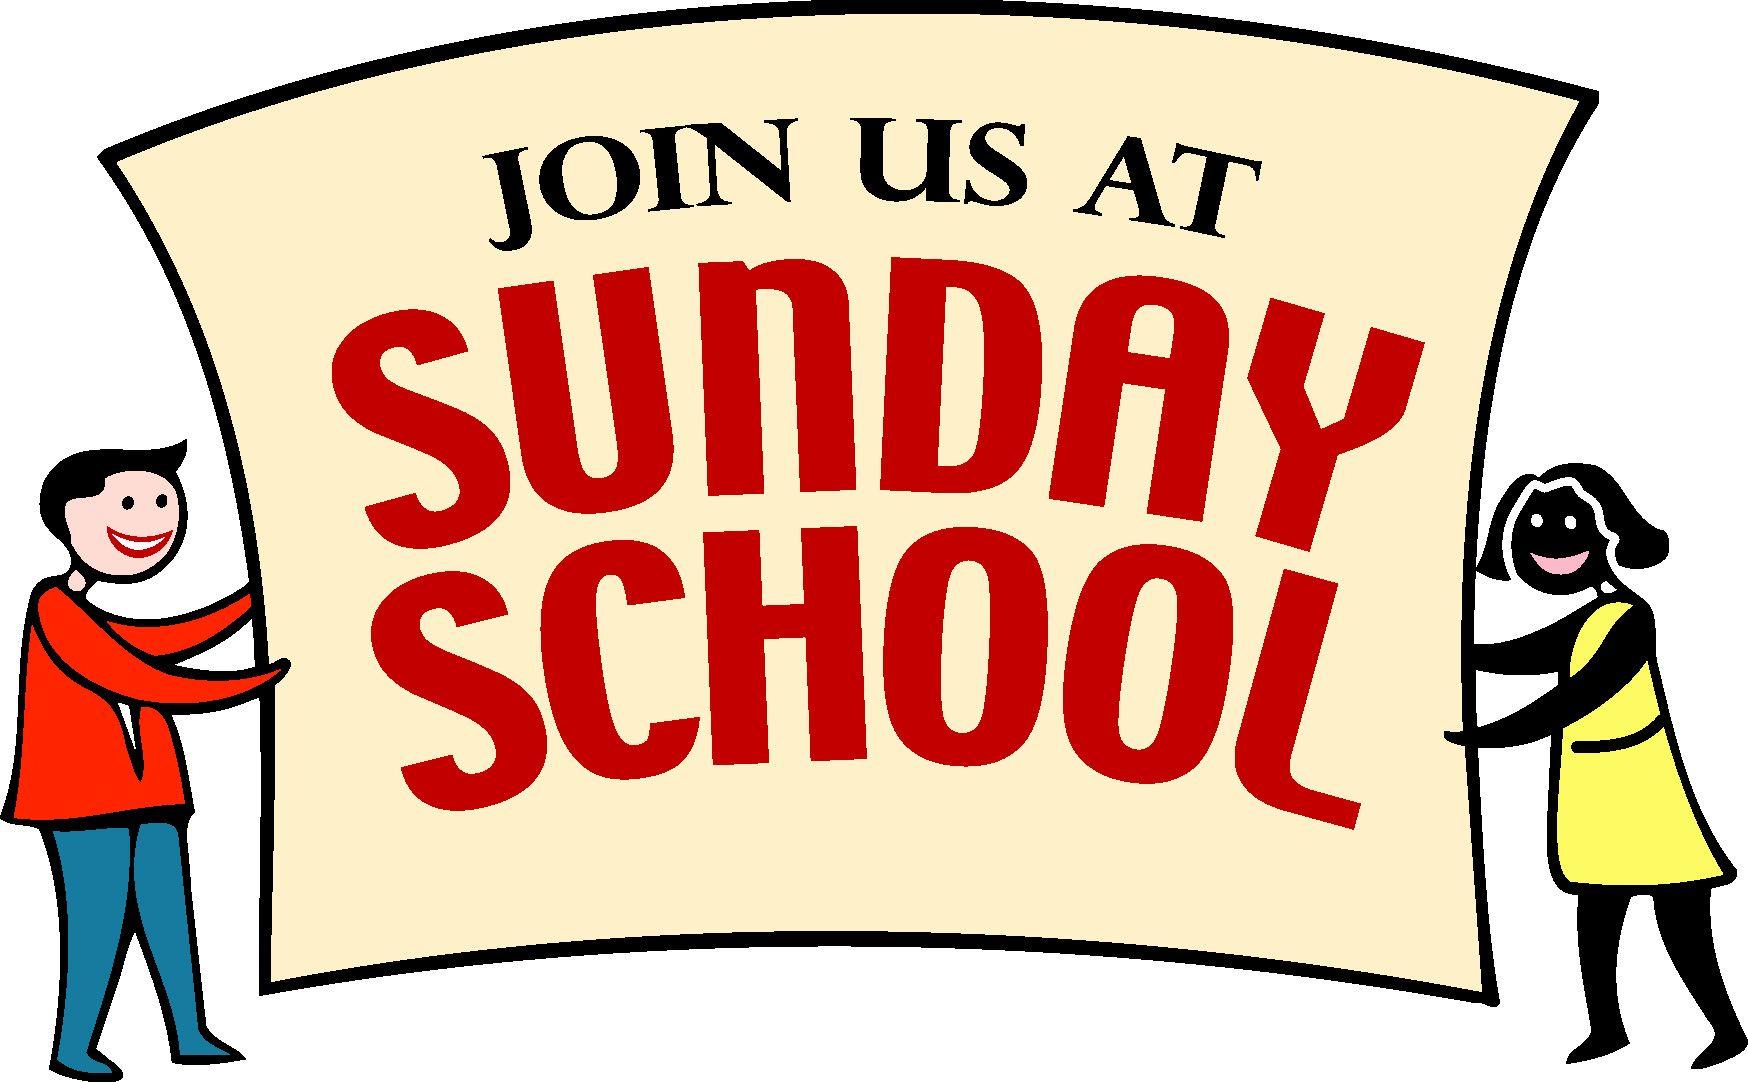 Sunday School Clip Art | Clipart Panda - Free Clipart Images | School invitation, Sunday school, Sunday school crafts